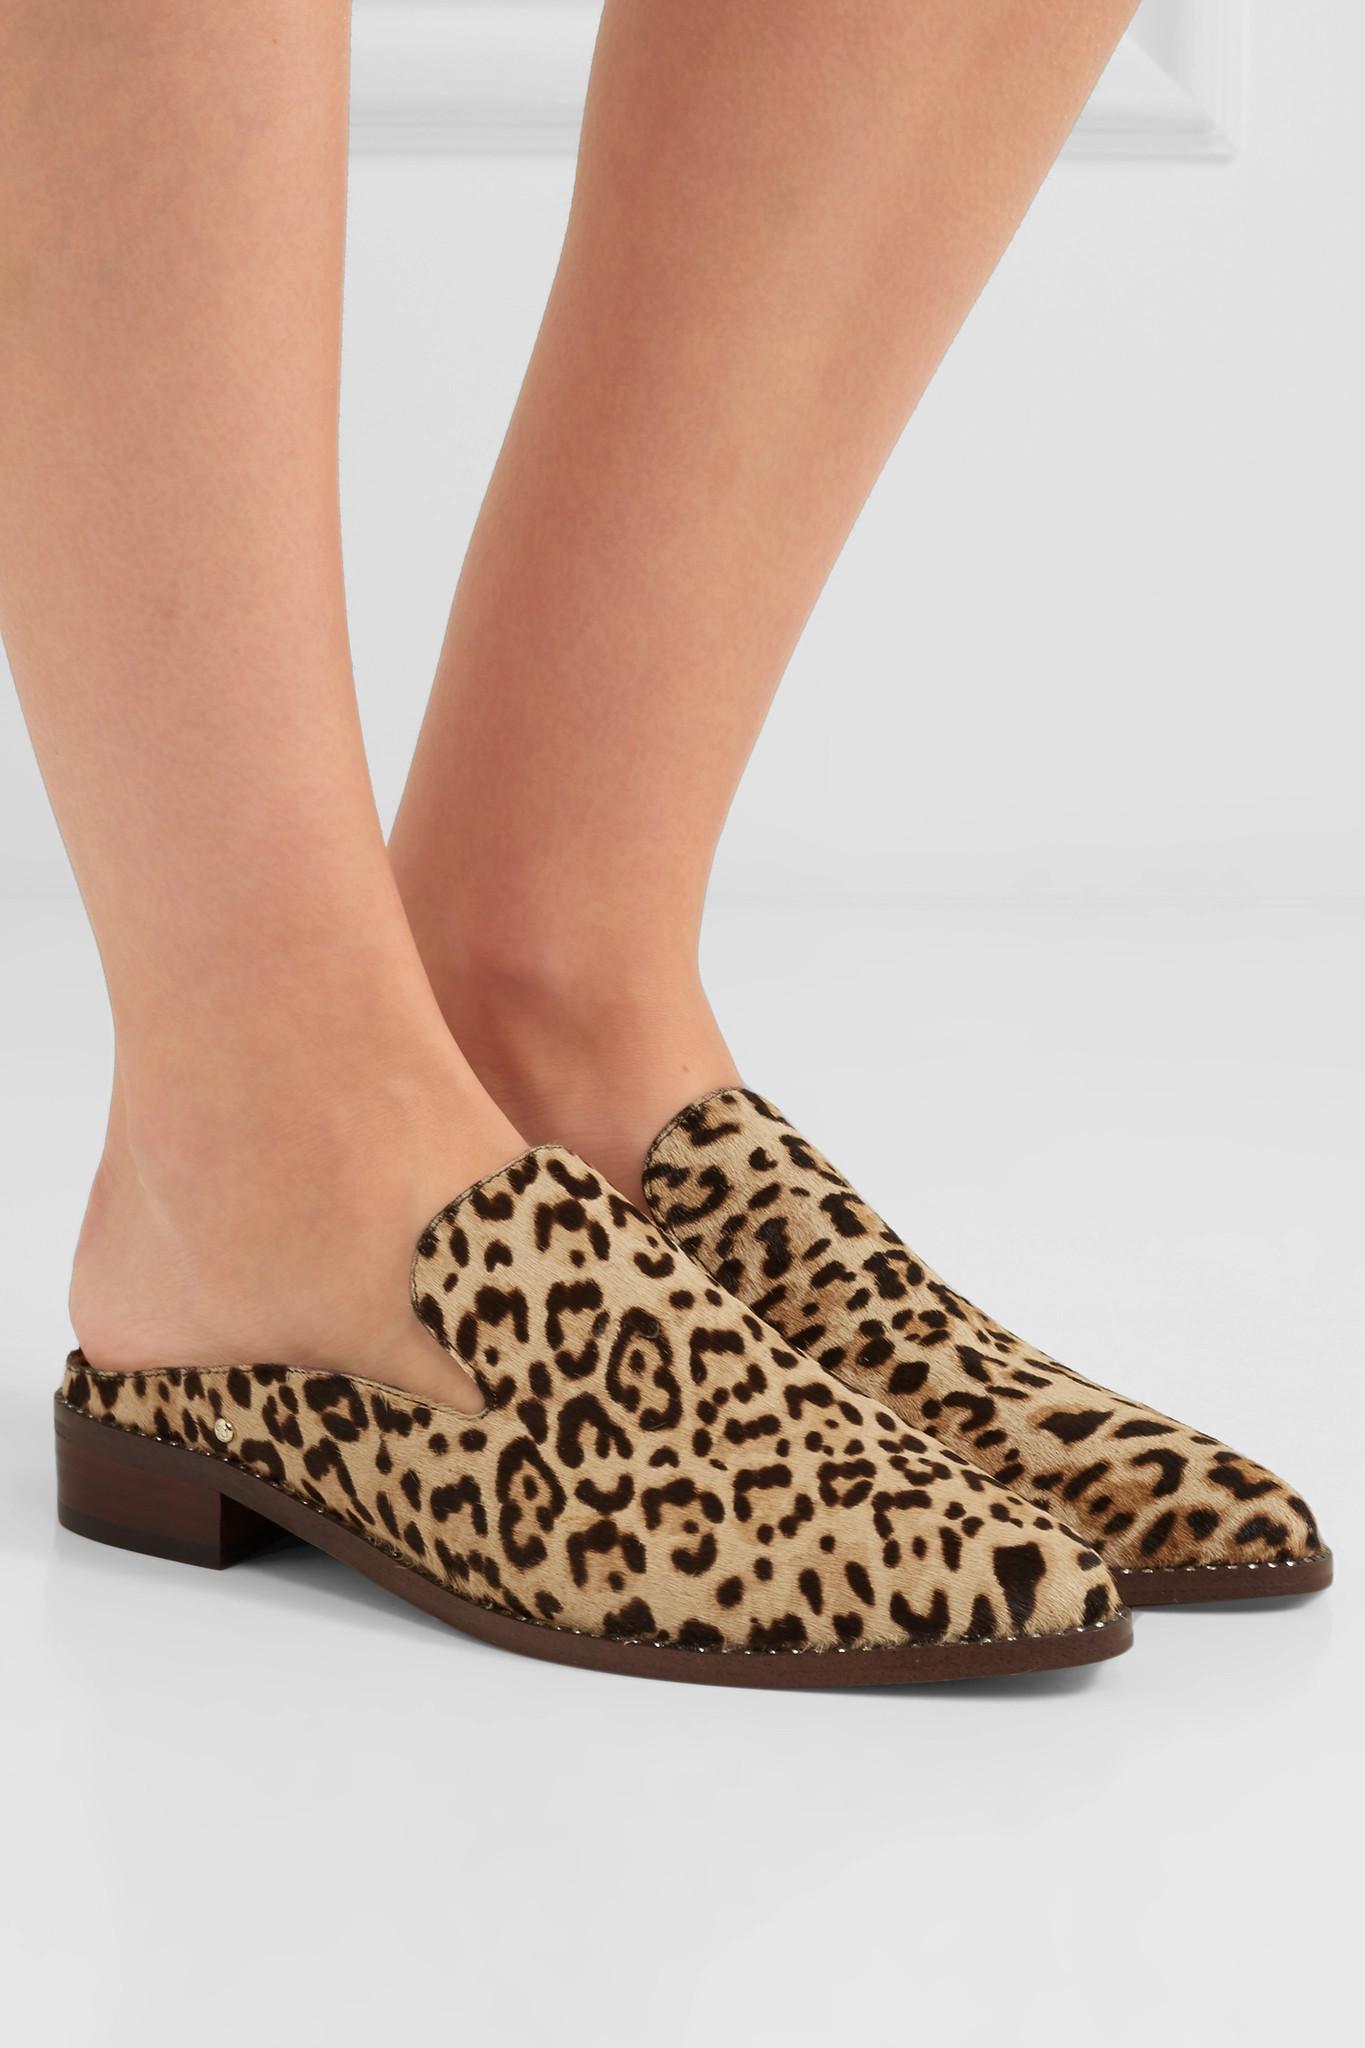 5ba01a43e Sam Edelman - Brown Crystal-embellished Leopard-print Calf Hair Slippers -  Lyst. View fullscreen